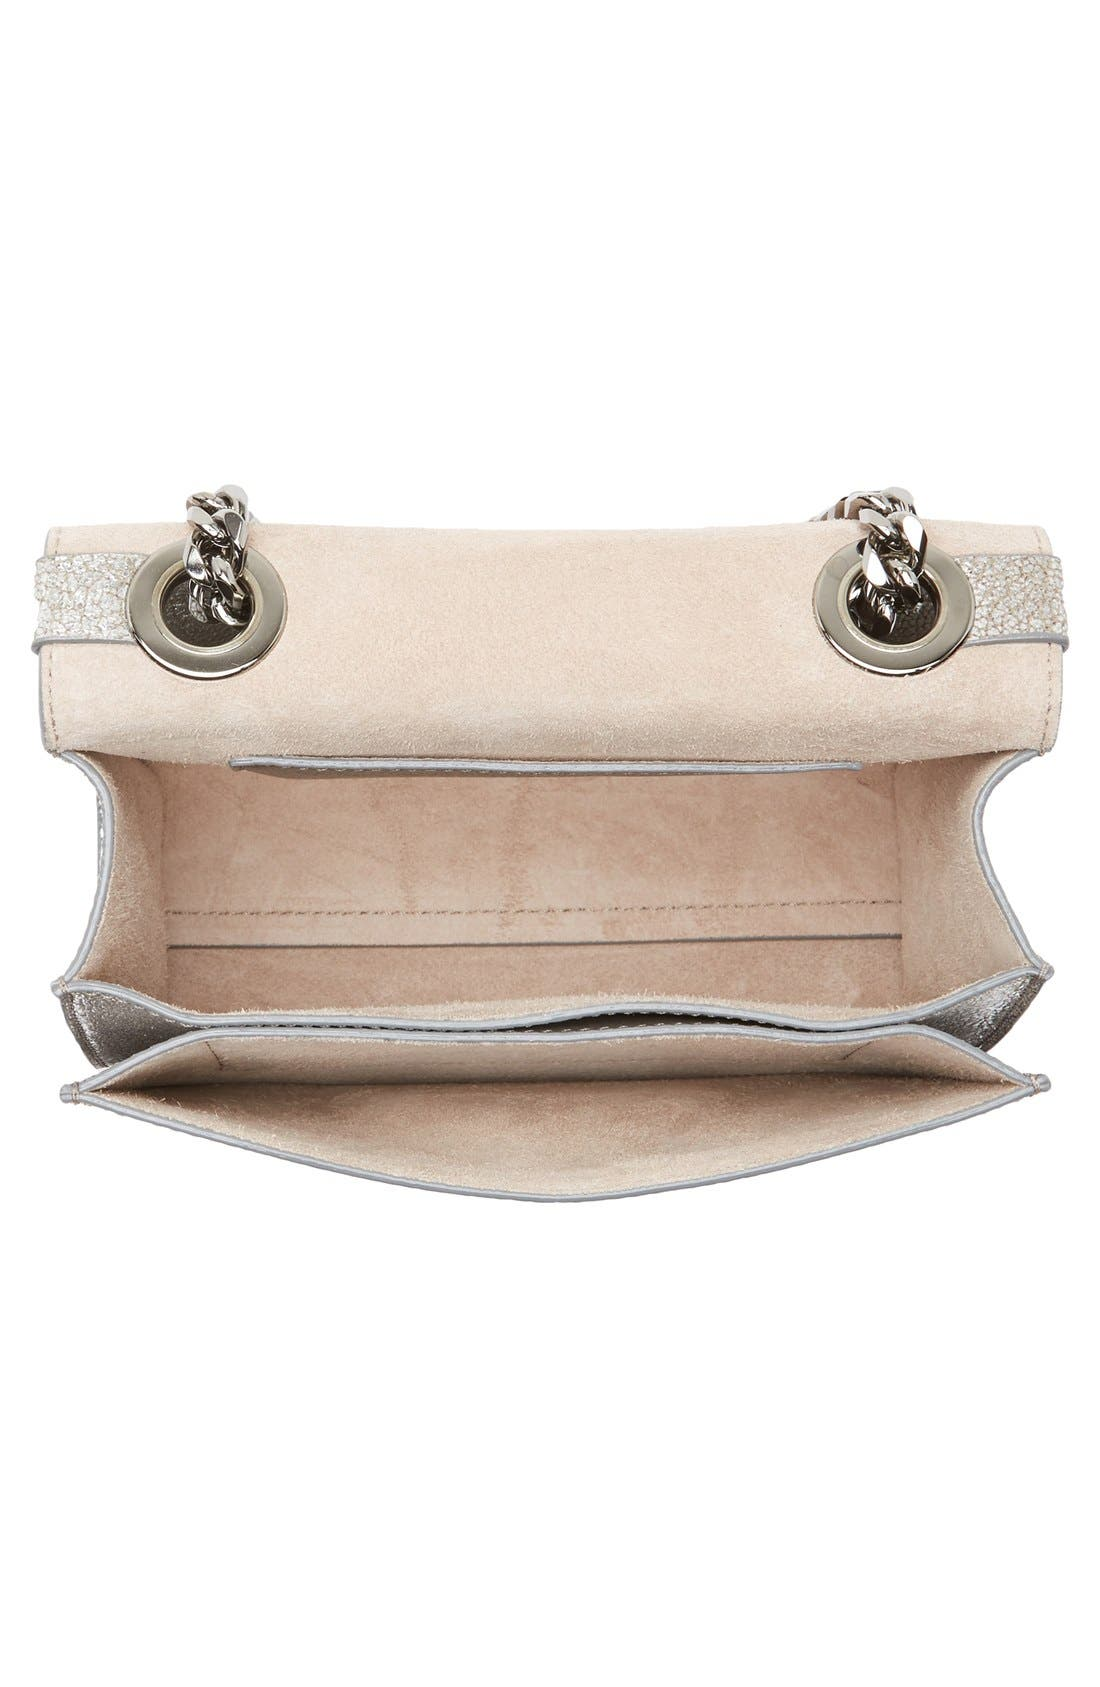 Rebel Mini Metallic Leather Crossbody Bag,                             Alternate thumbnail 4, color,                             040